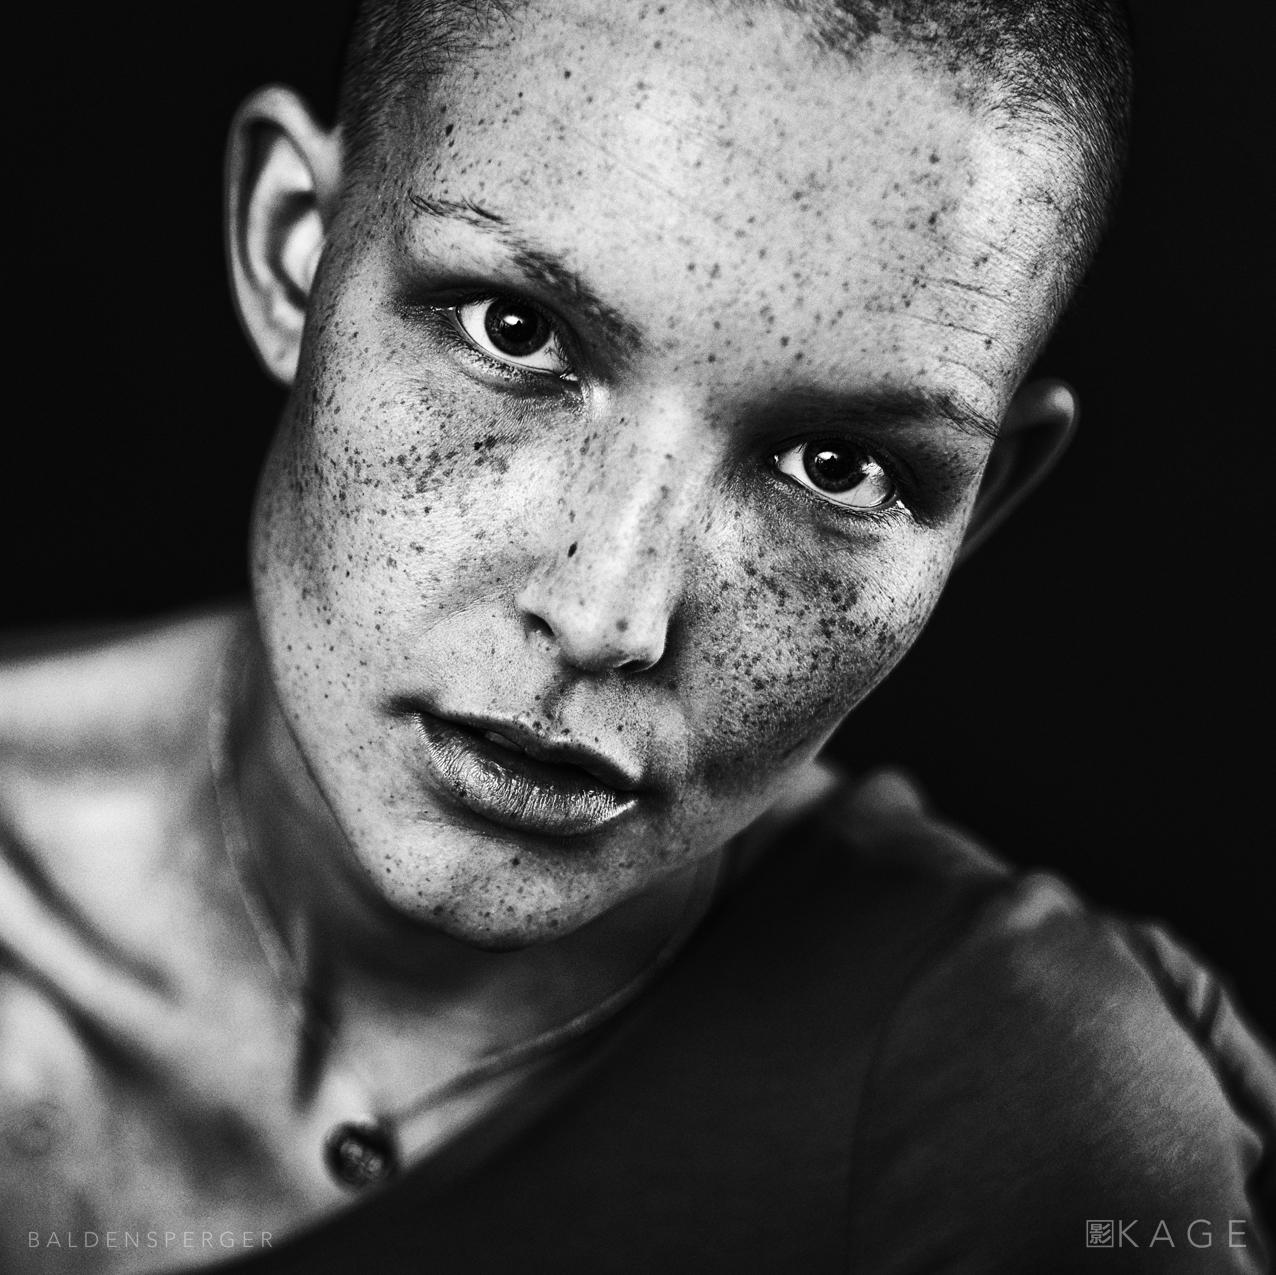 Auxane  Vincent Baldensperger | X-Pro2. | 56mm 1/125 at f/1.8,ISO 100.